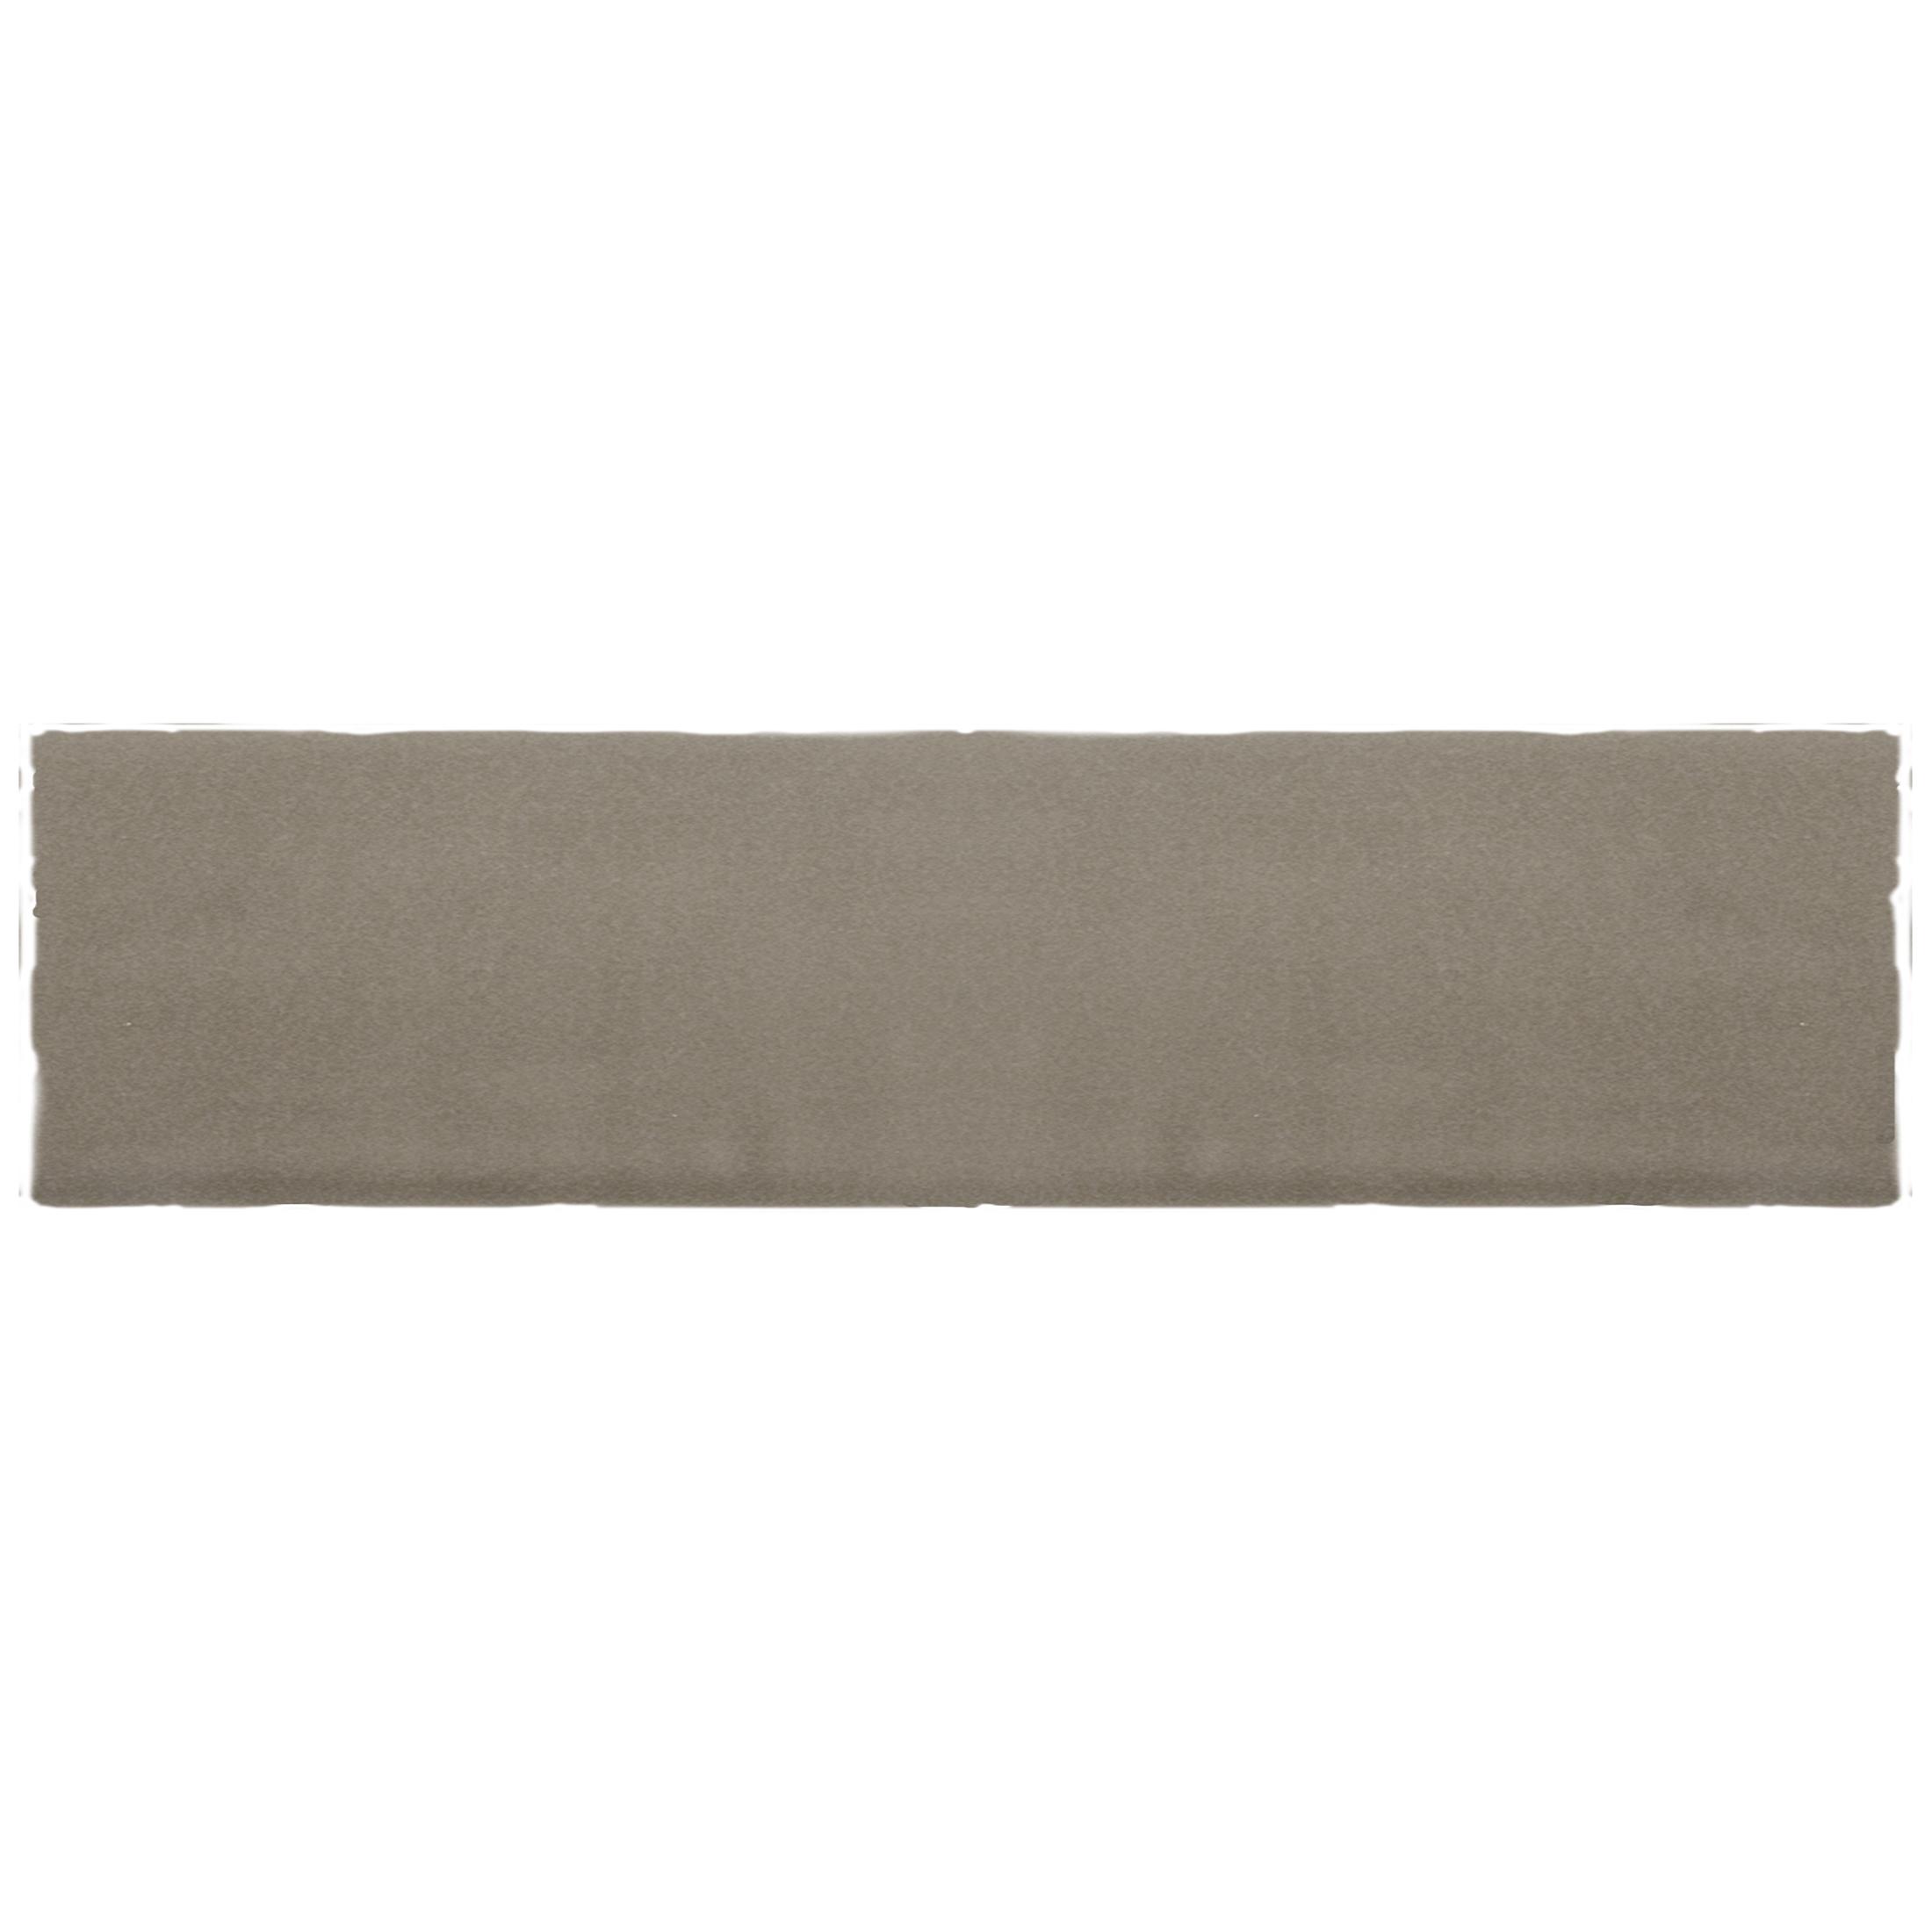 ADNT1019 - LISO  - 7.5 cm X 30 cm